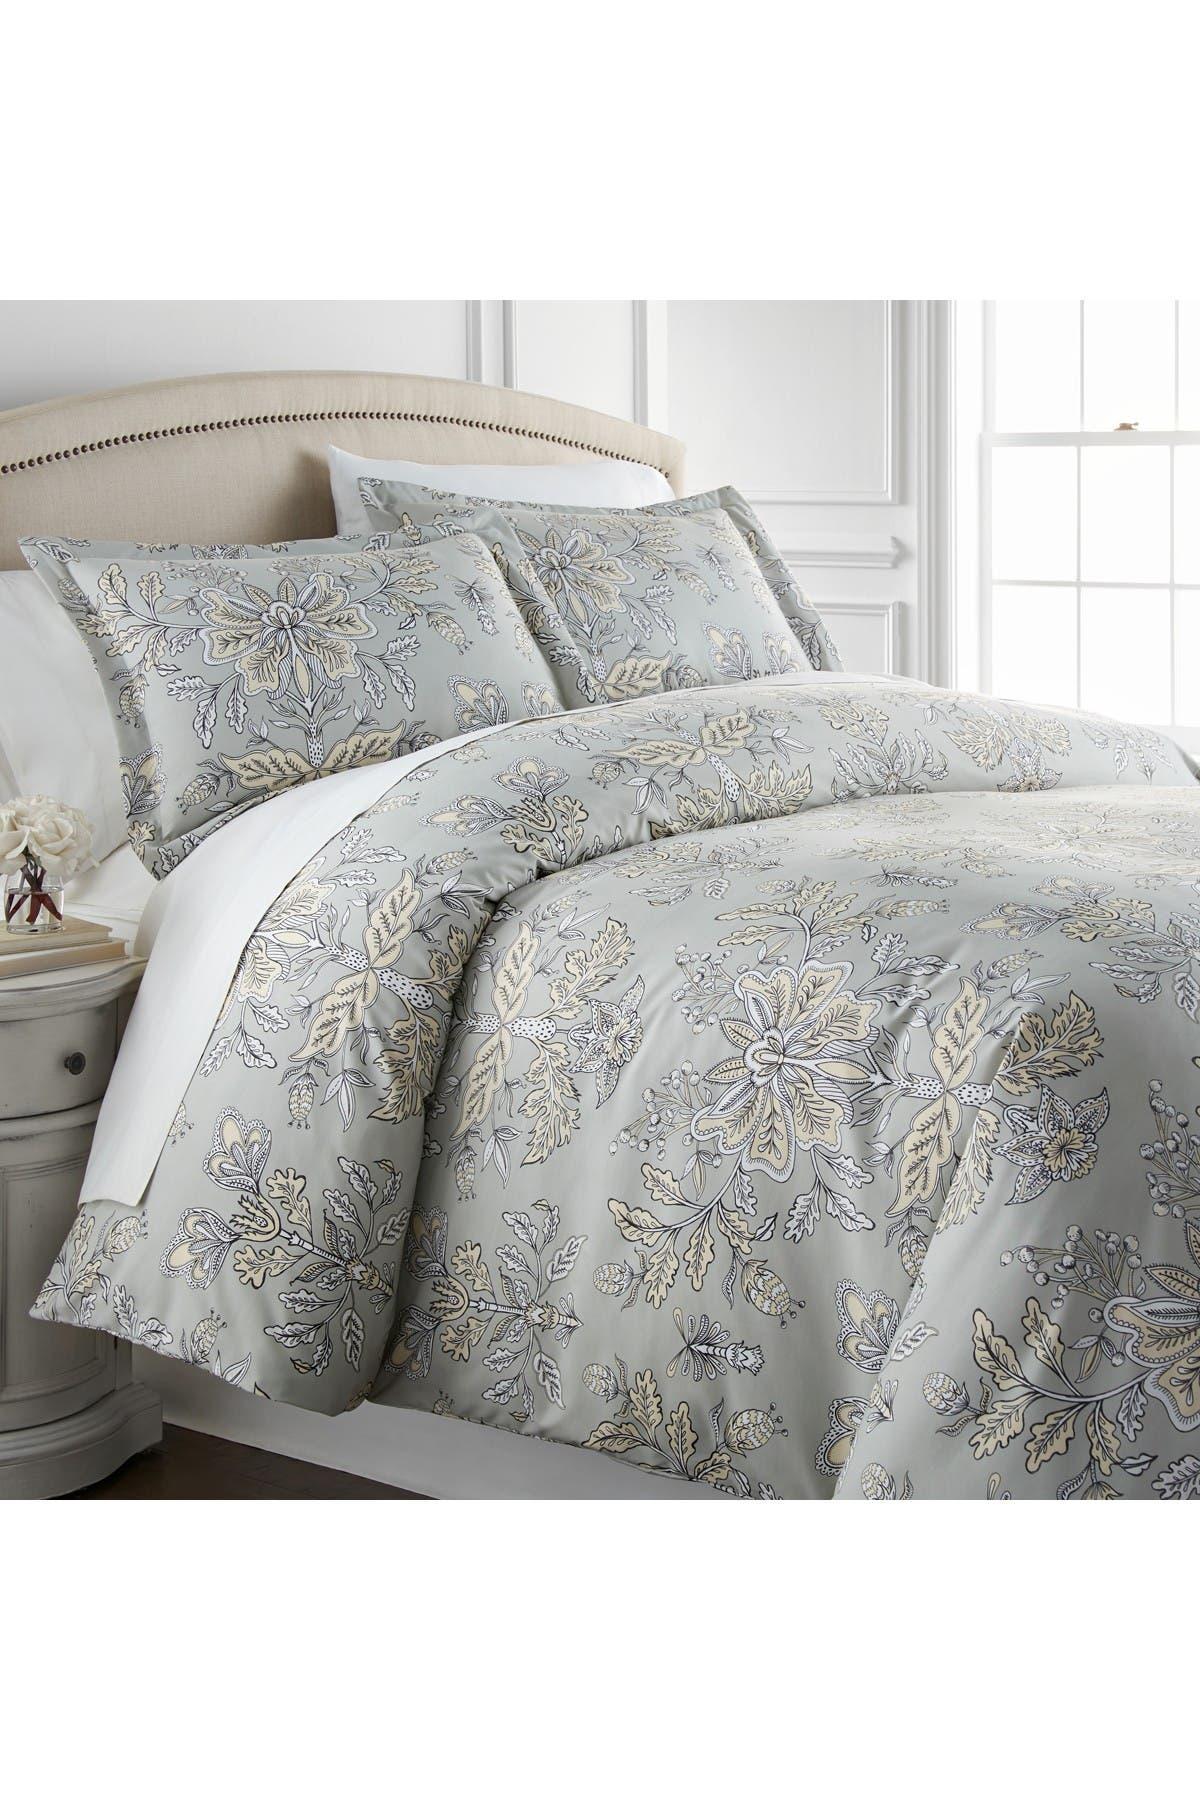 Southshore Fine Linens King California King Luxury Premium Oversized Comforter Sets Vintage Garden Sandy Grey Nordstrom Rack